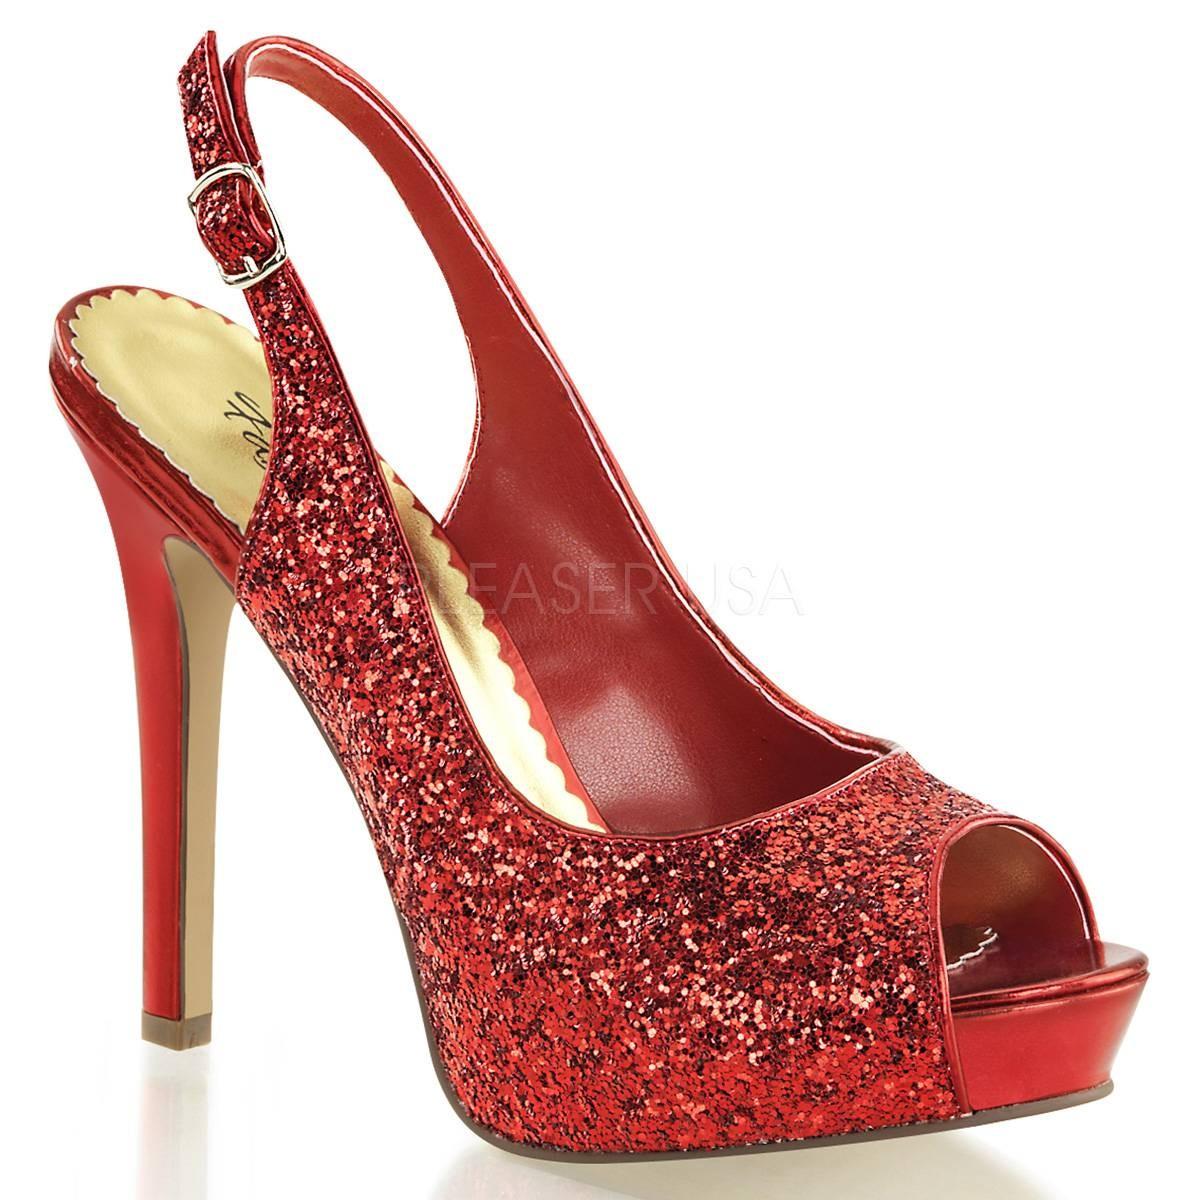 Highheels für Frauen - LUMINA 28G ° Damen Peep Toe Sandalette ° Rot Glitter ° Fabulicious  - Onlineshop RedSixty